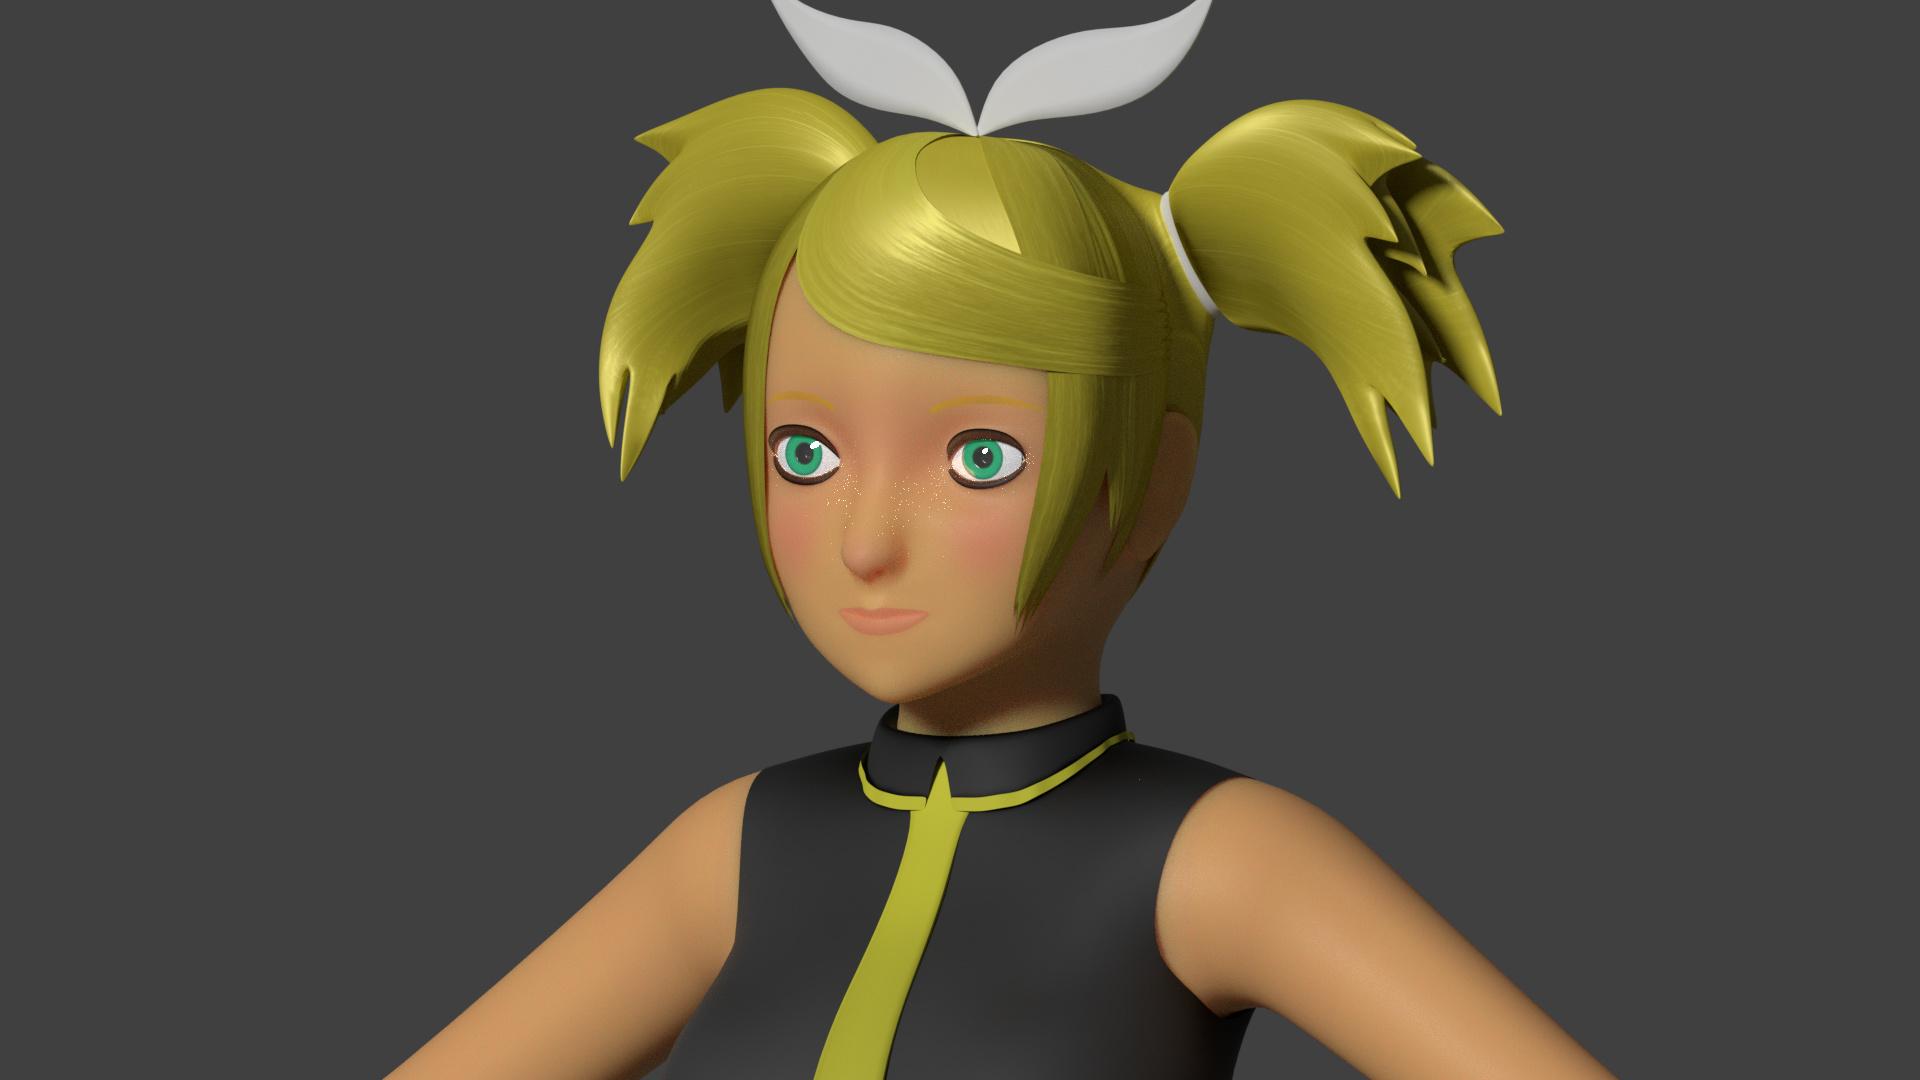 Semi-Realistic Anime Character - Works in Progress - Blender